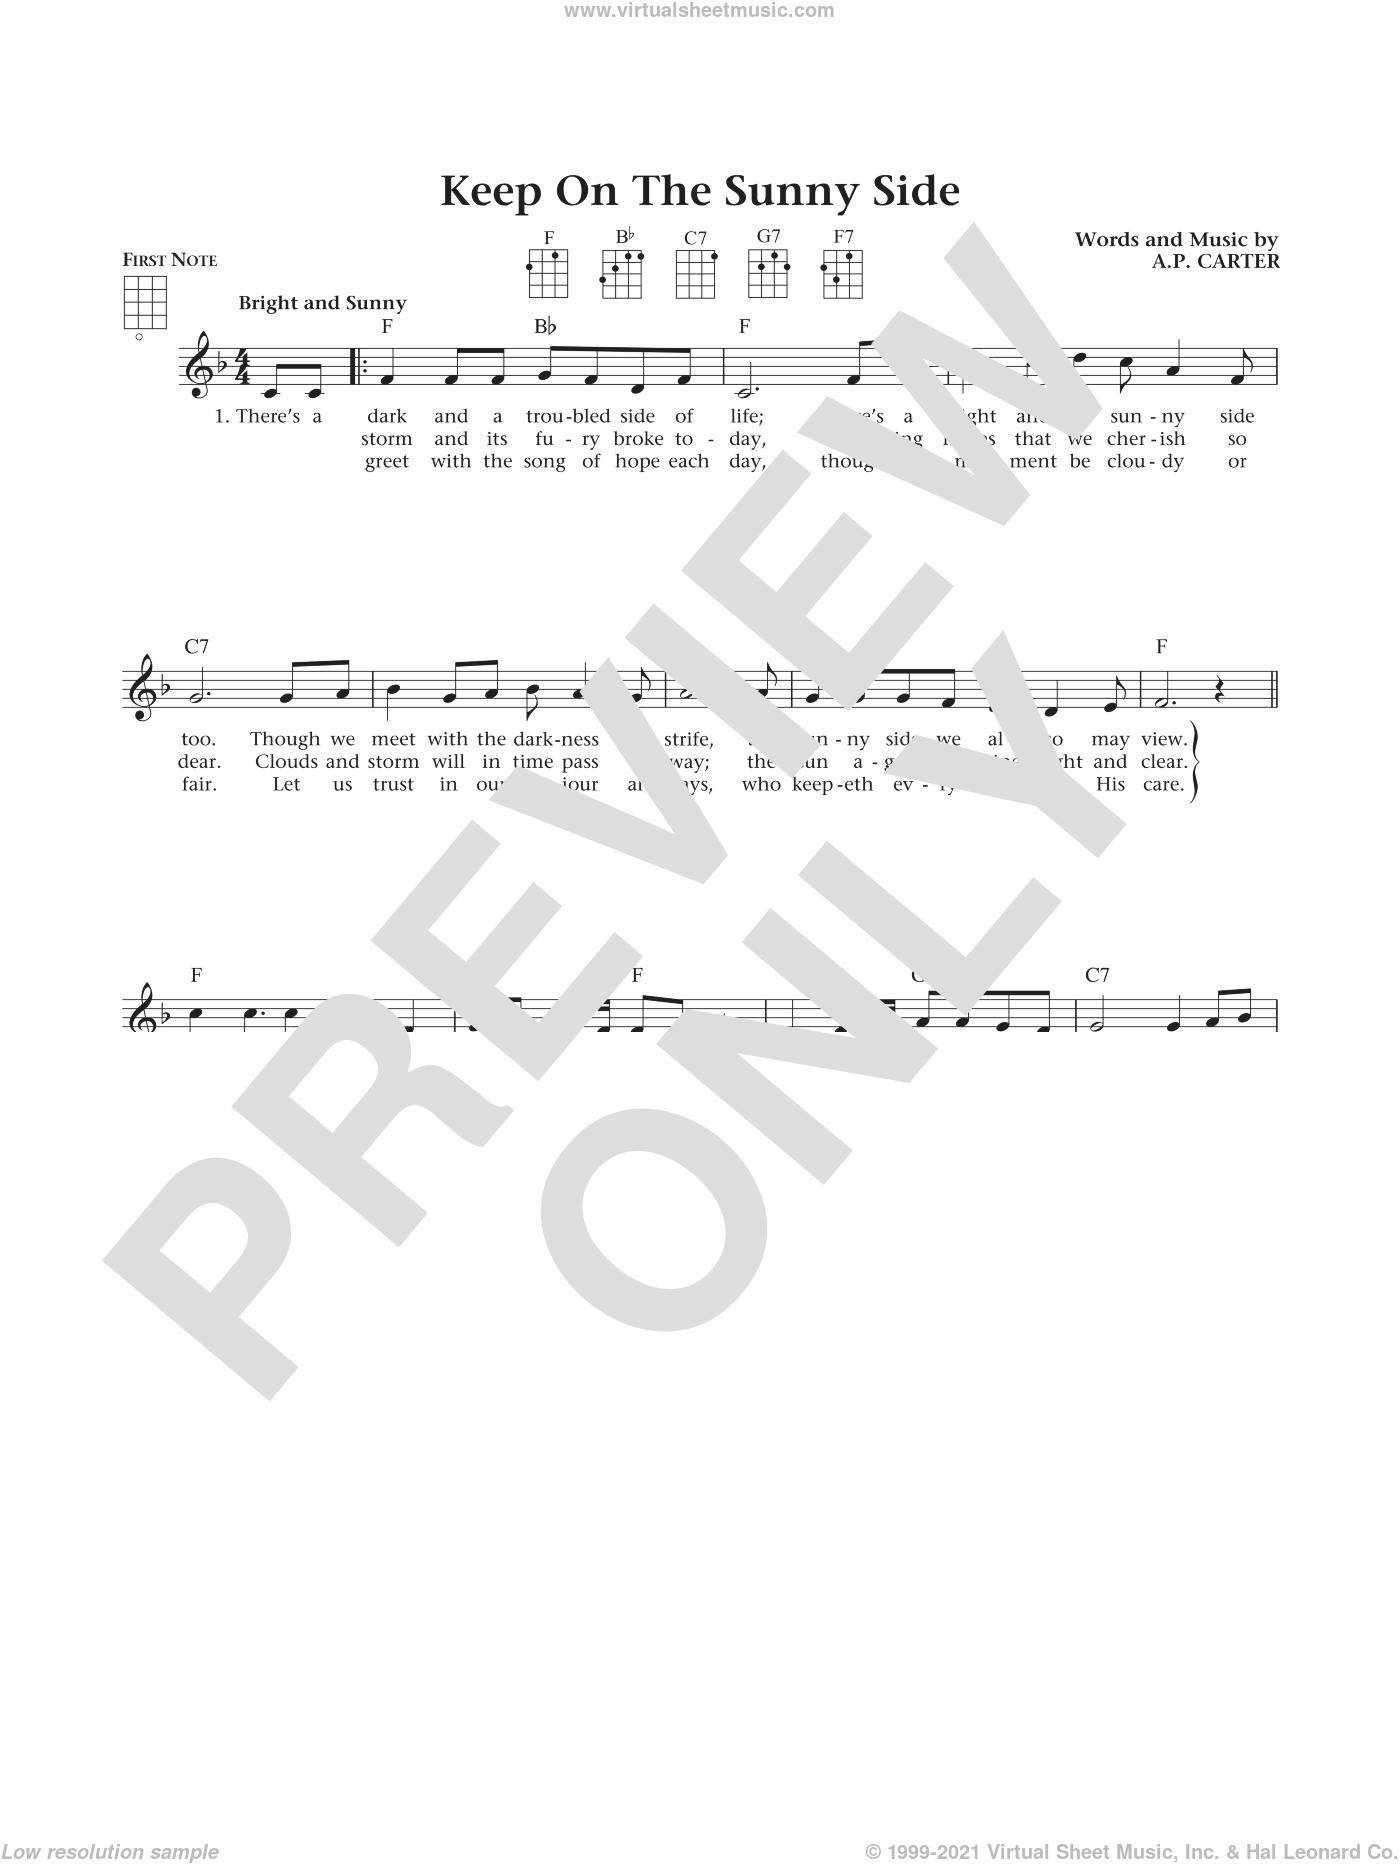 Keep On The Sunny Side (from The Daily Ukulele) (arr. Liz and Jim Beloff) sheet music for ukulele by The Carter Family, Jim Beloff, Liz Beloff and A.P. Carter, intermediate skill level